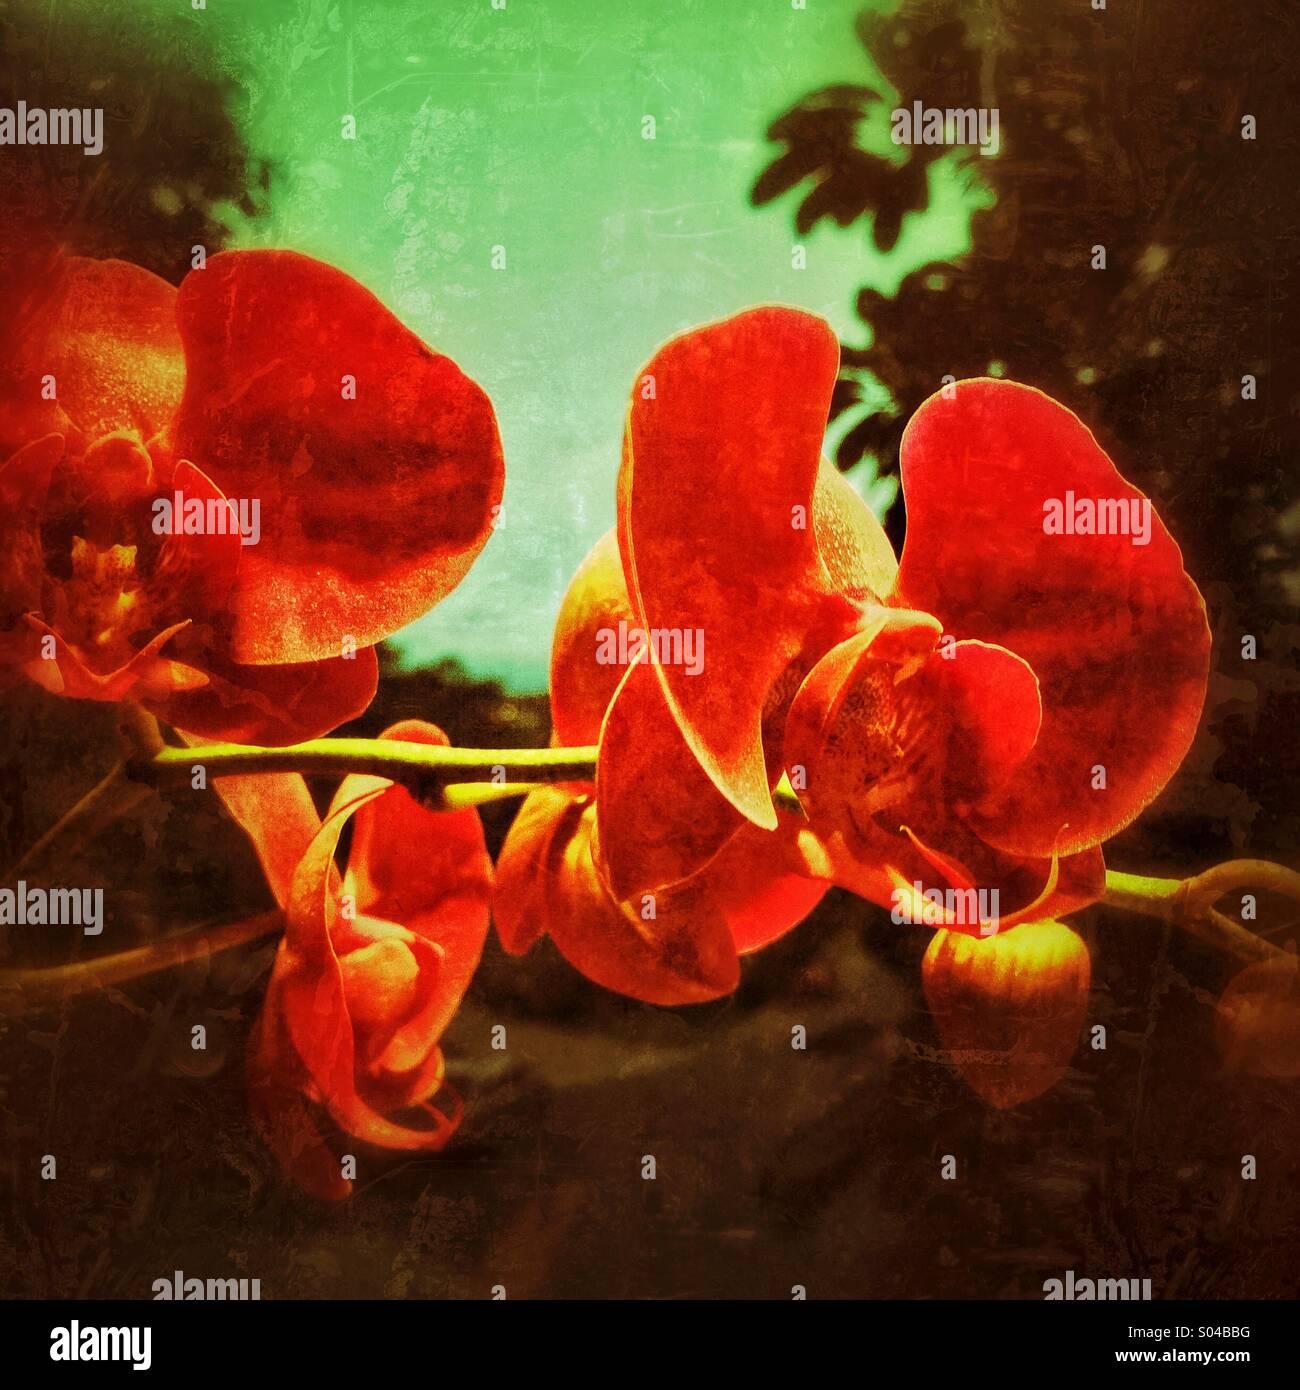 Flor de orquídea roja Imagen De Stock